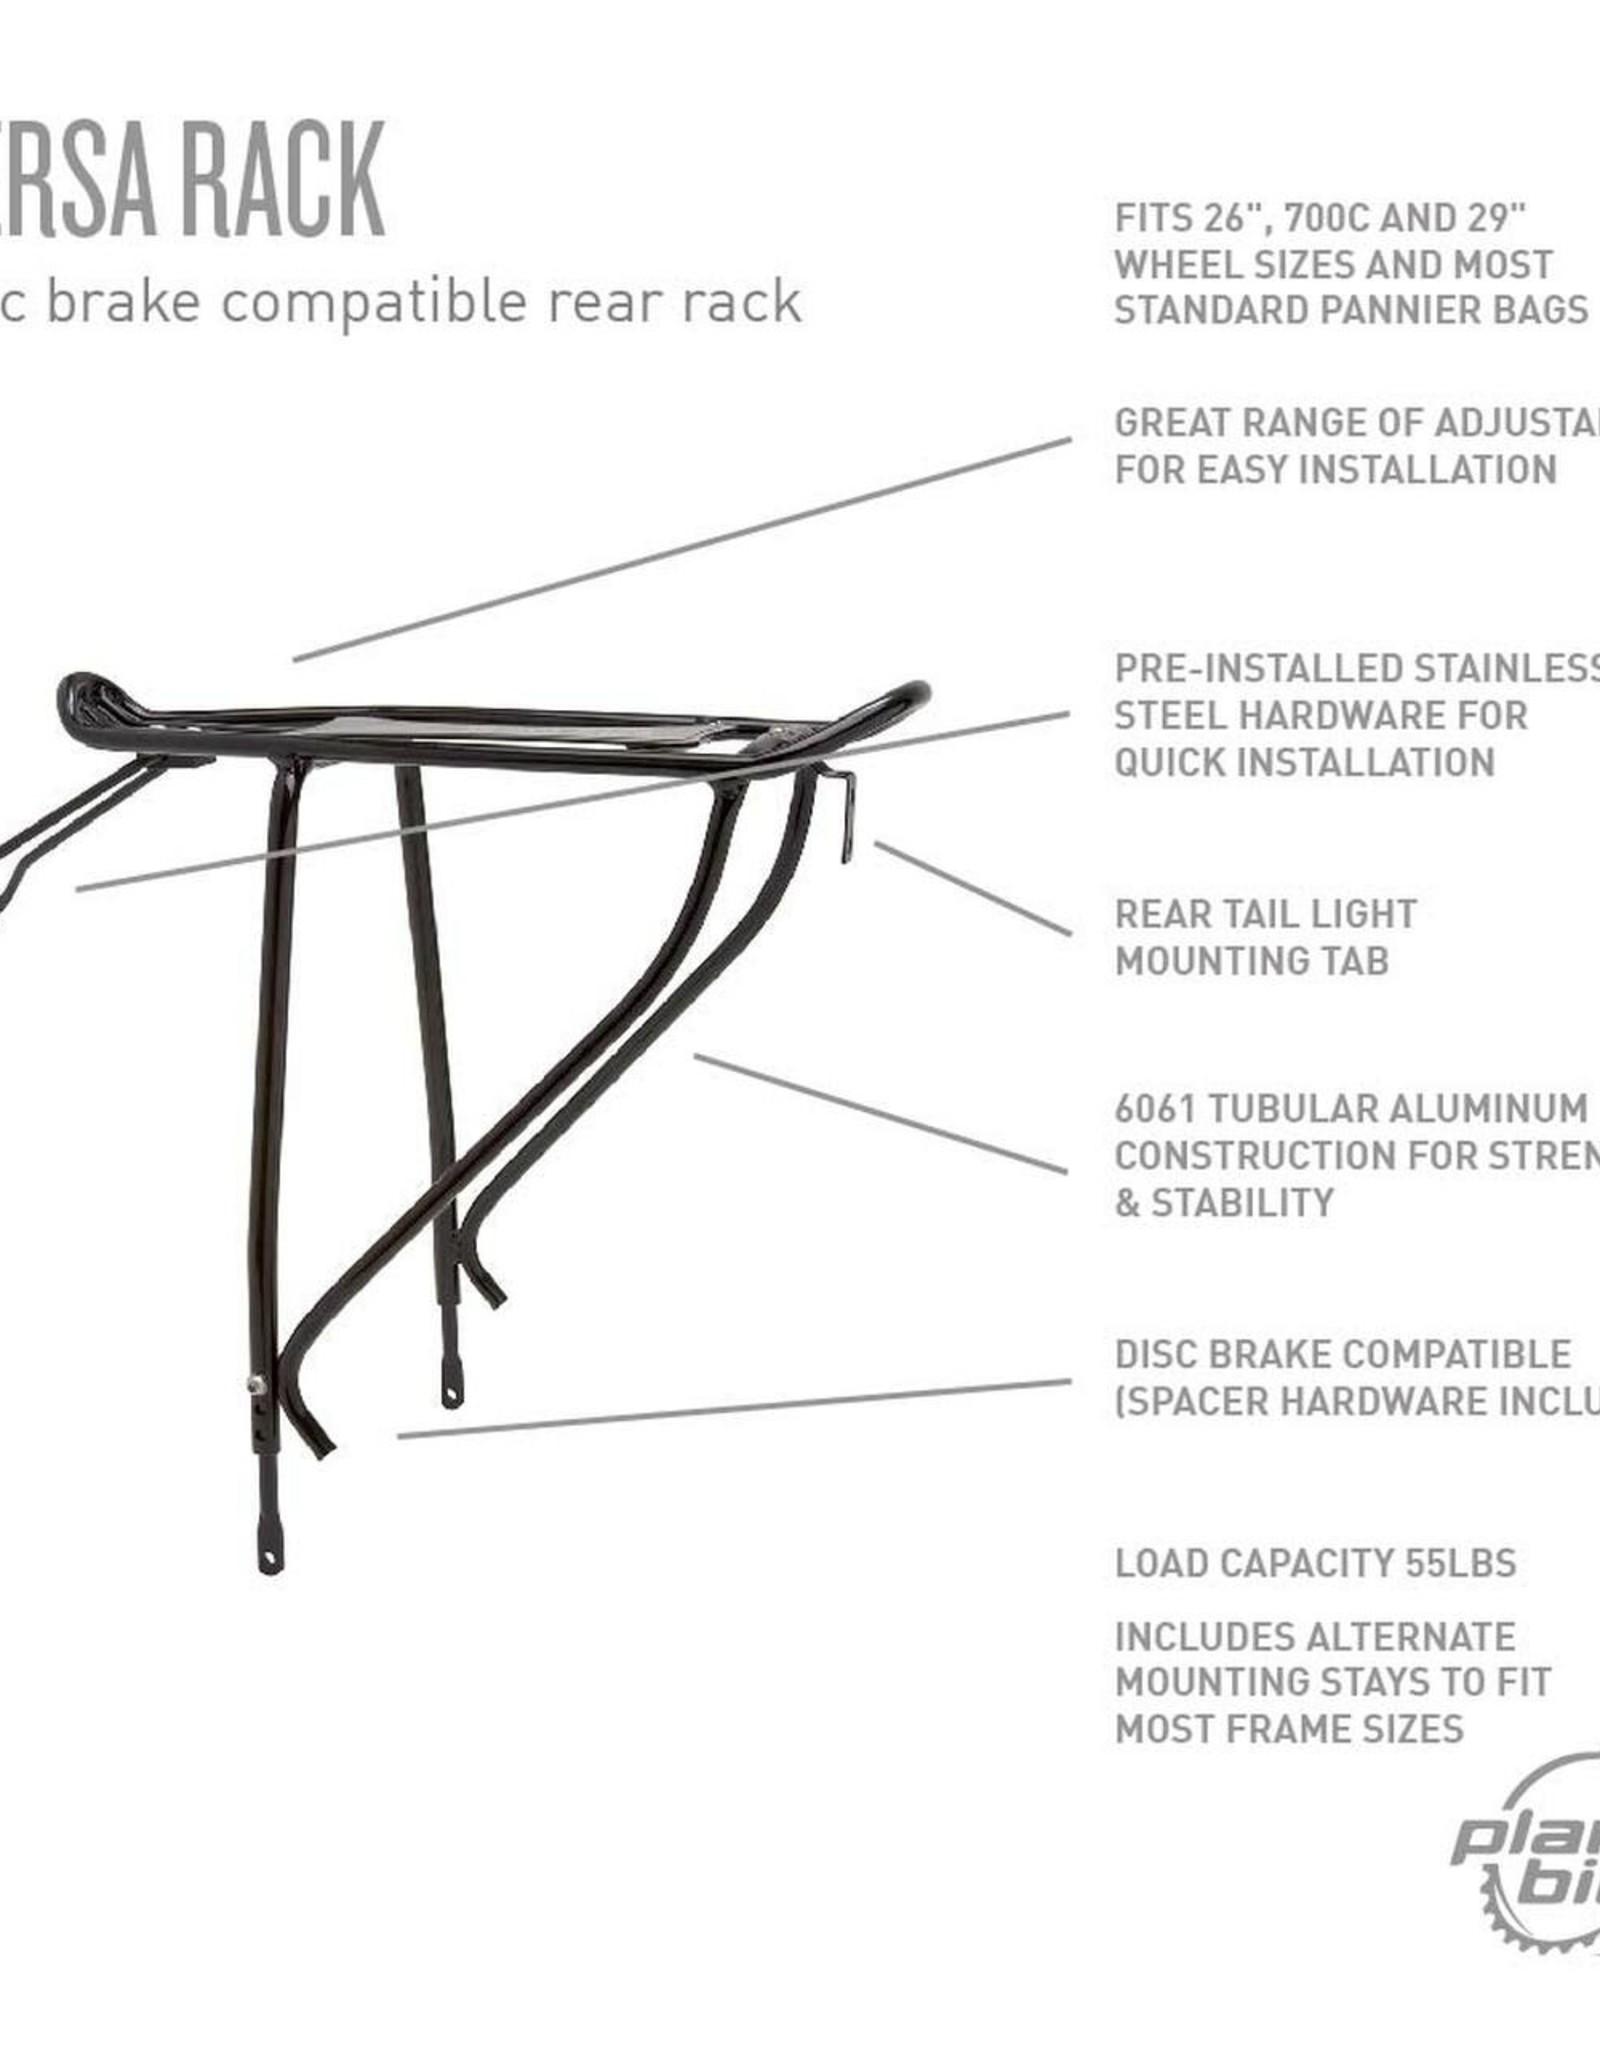 "Planet Bike Versa Disc Brake Compatible Rear Rack: Black. Fits up to 29"" wheels"